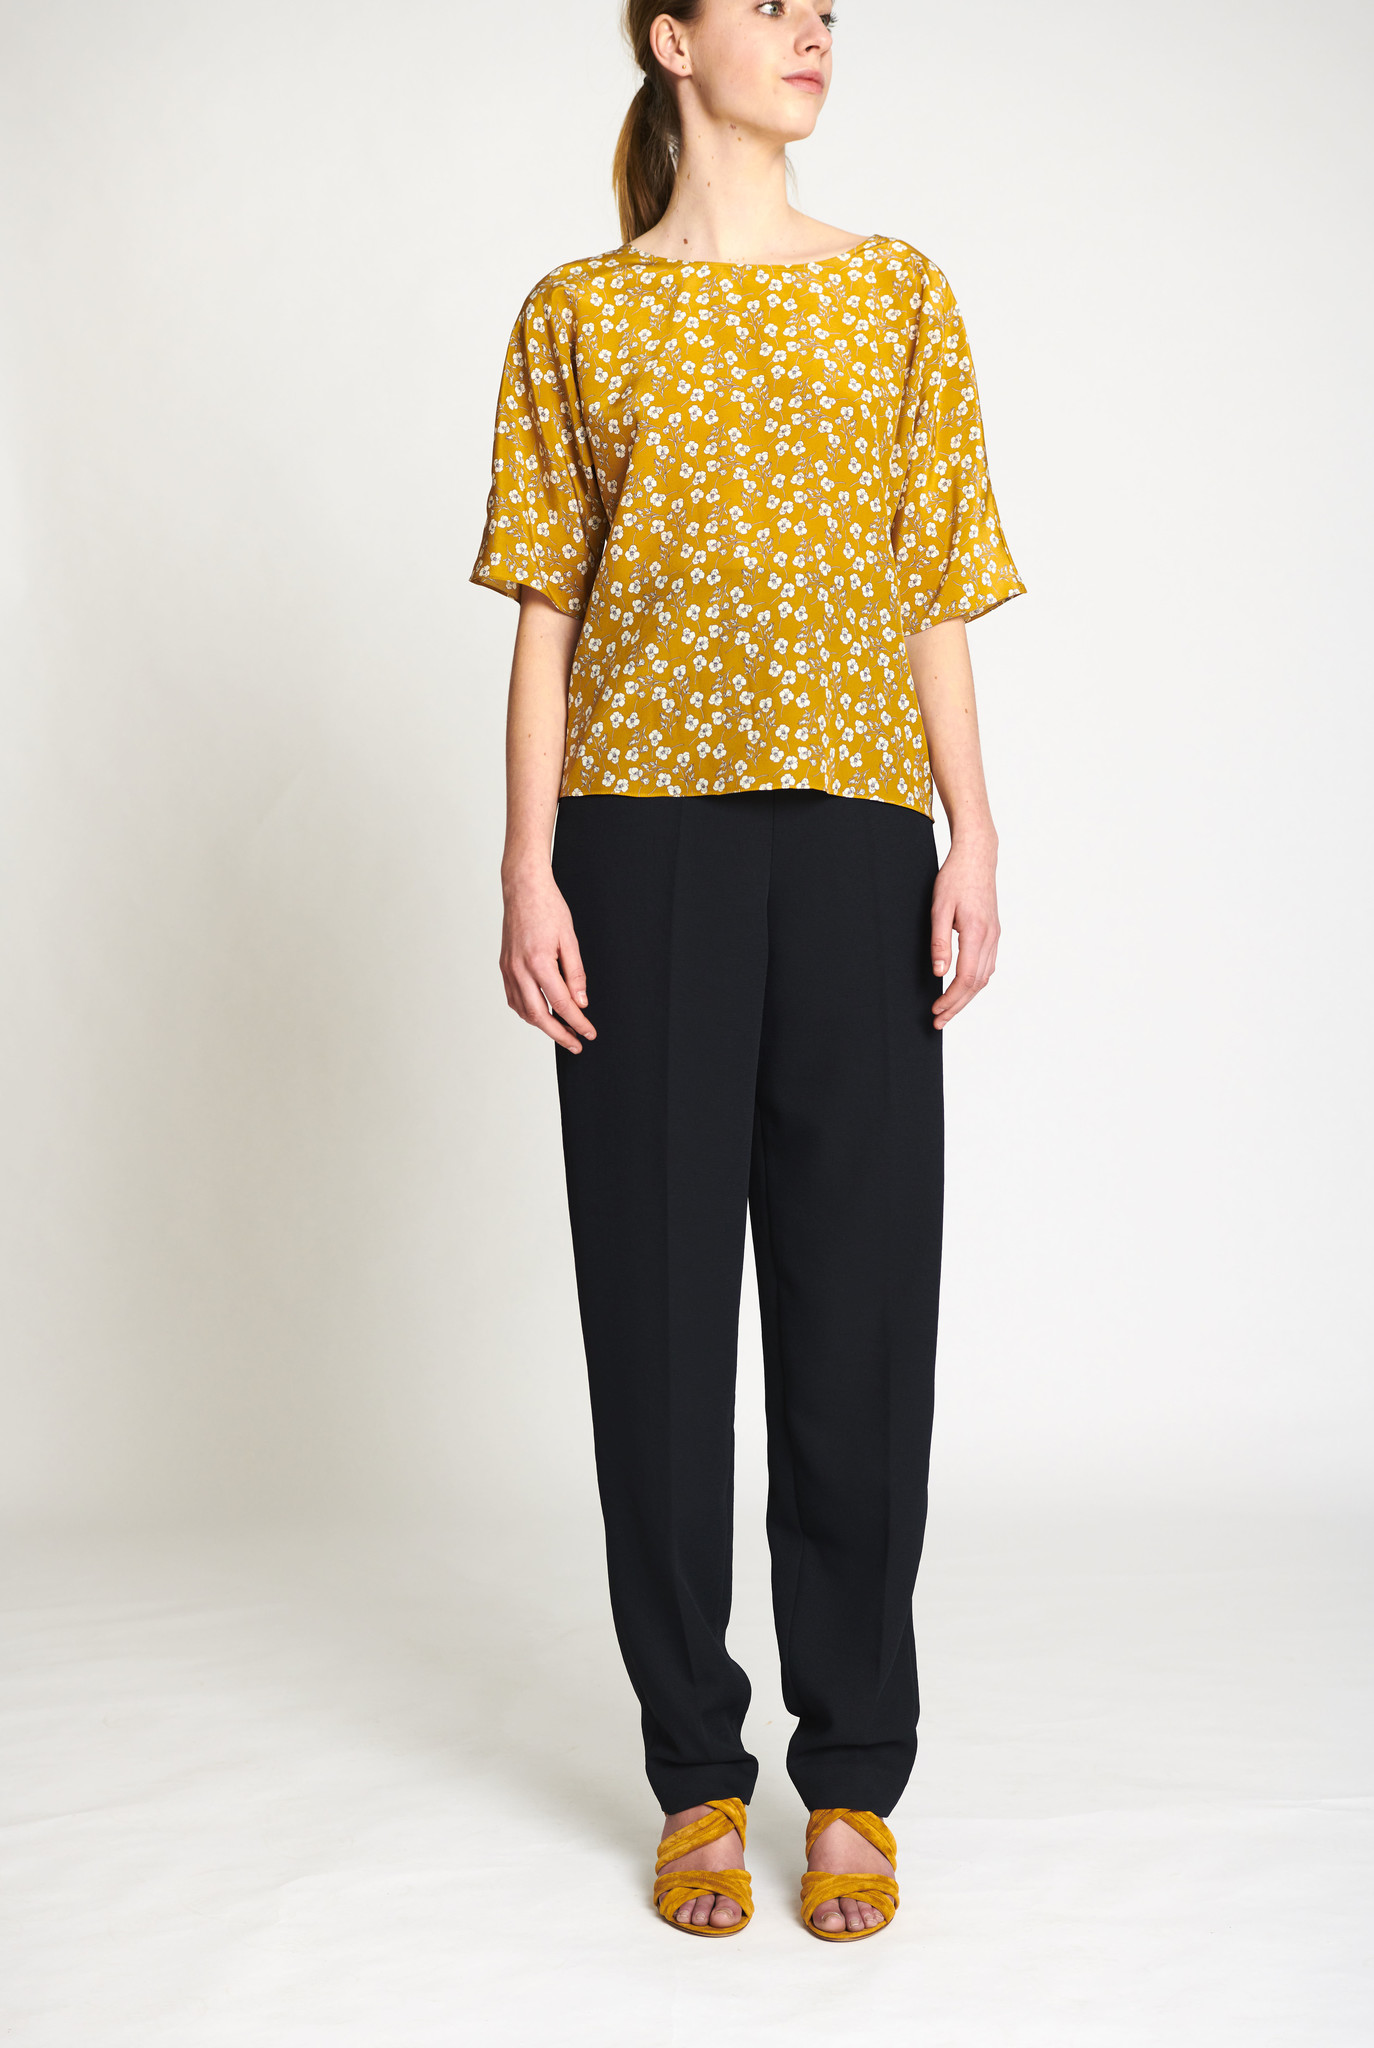 Giuli blouse Ocre print